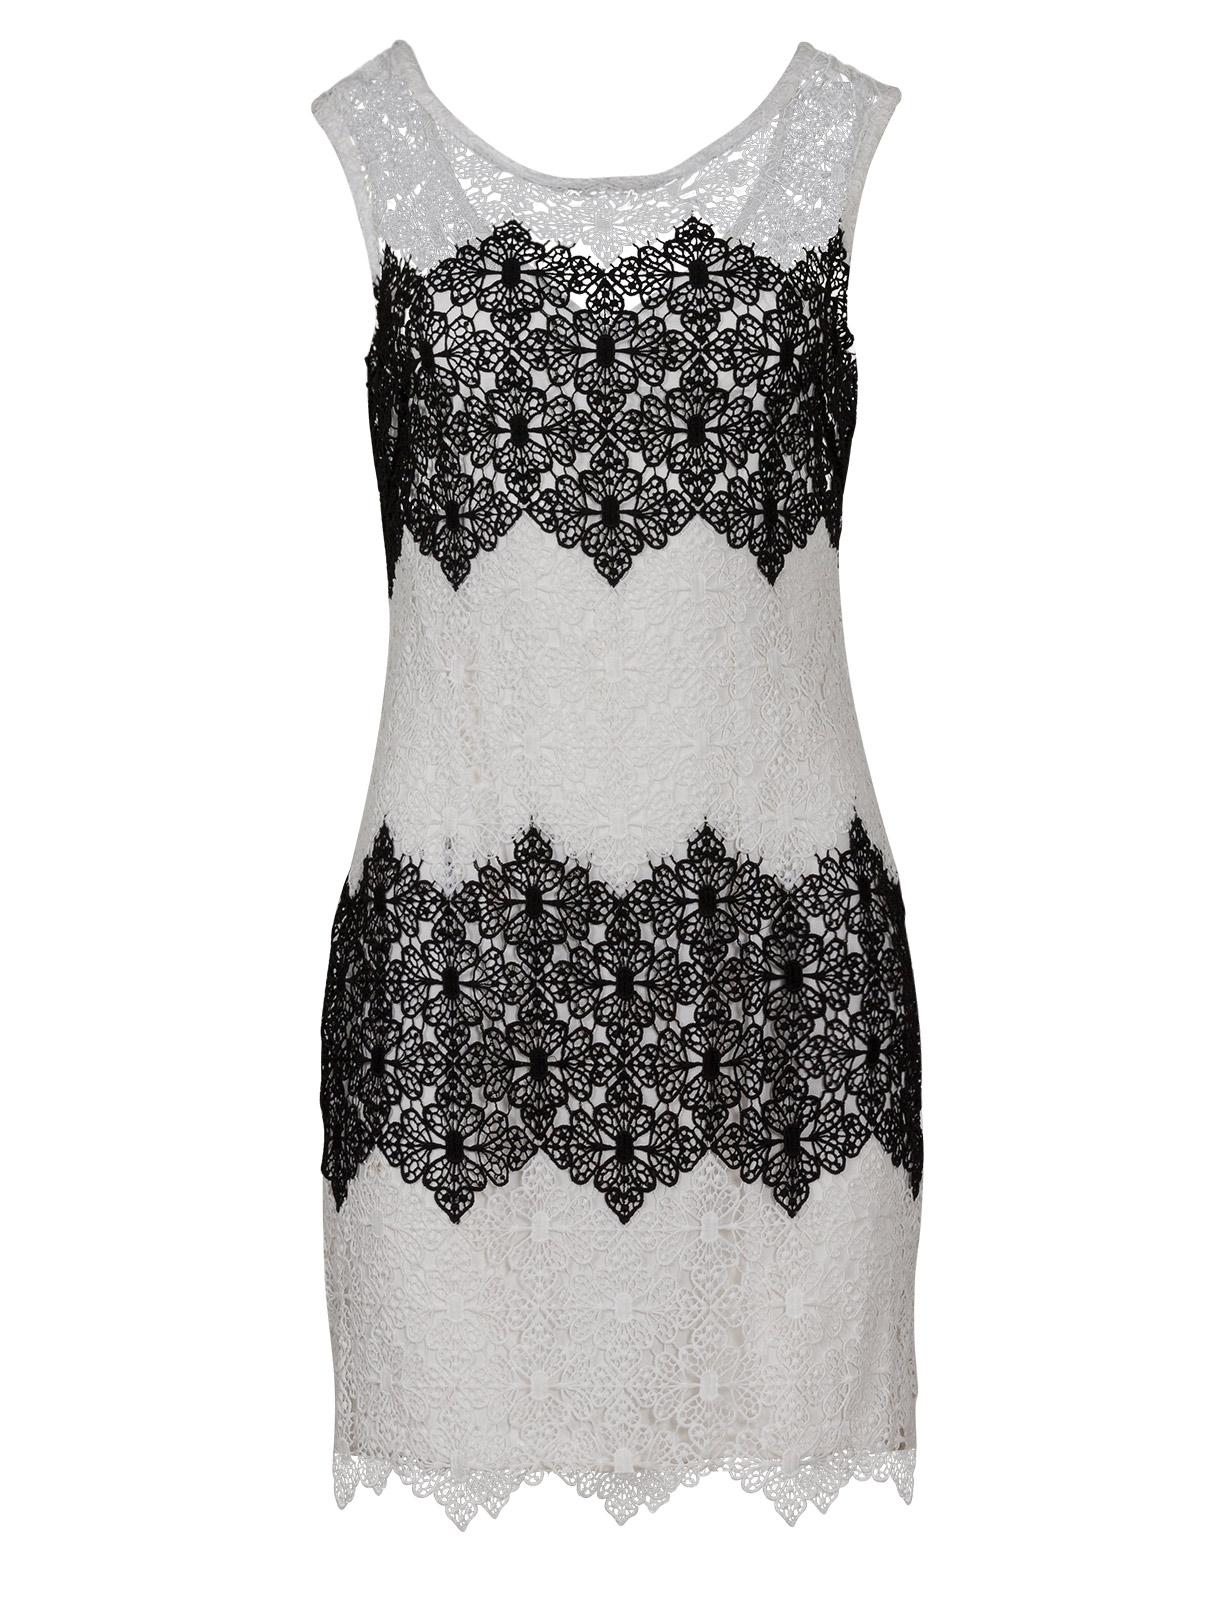 Crochet Ασπρόμαυρο Φόρεμα γυναικεια   φορέματα   mίνι   μίντι